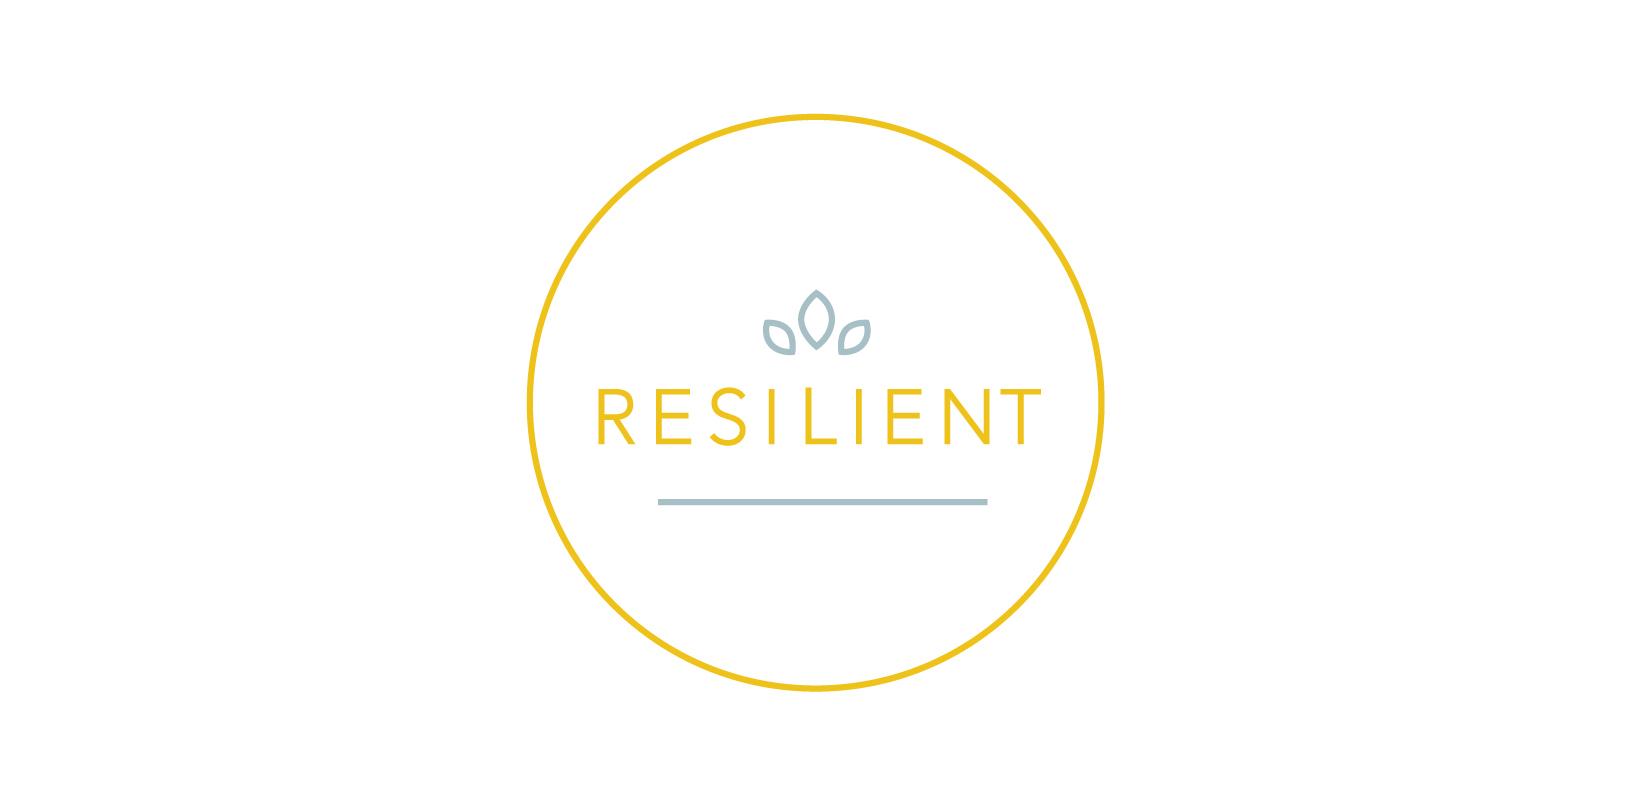 Resilient-branding-web-design-top